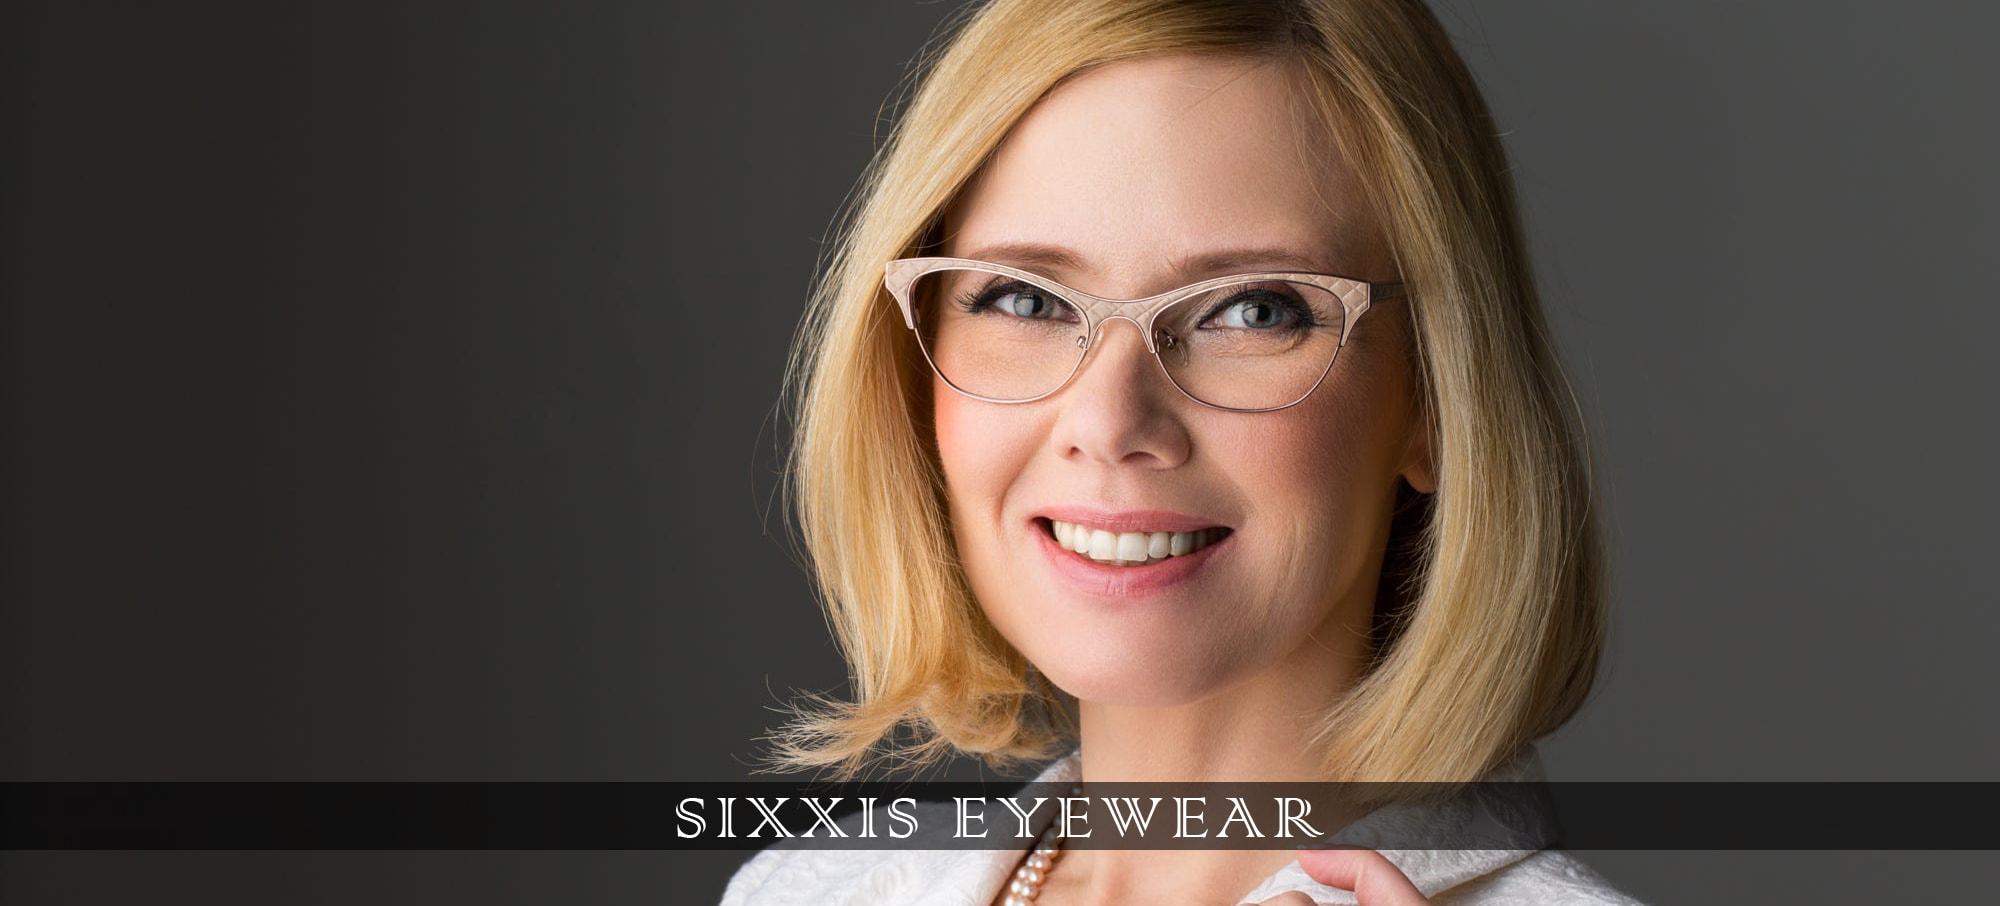 SIXXIS-M